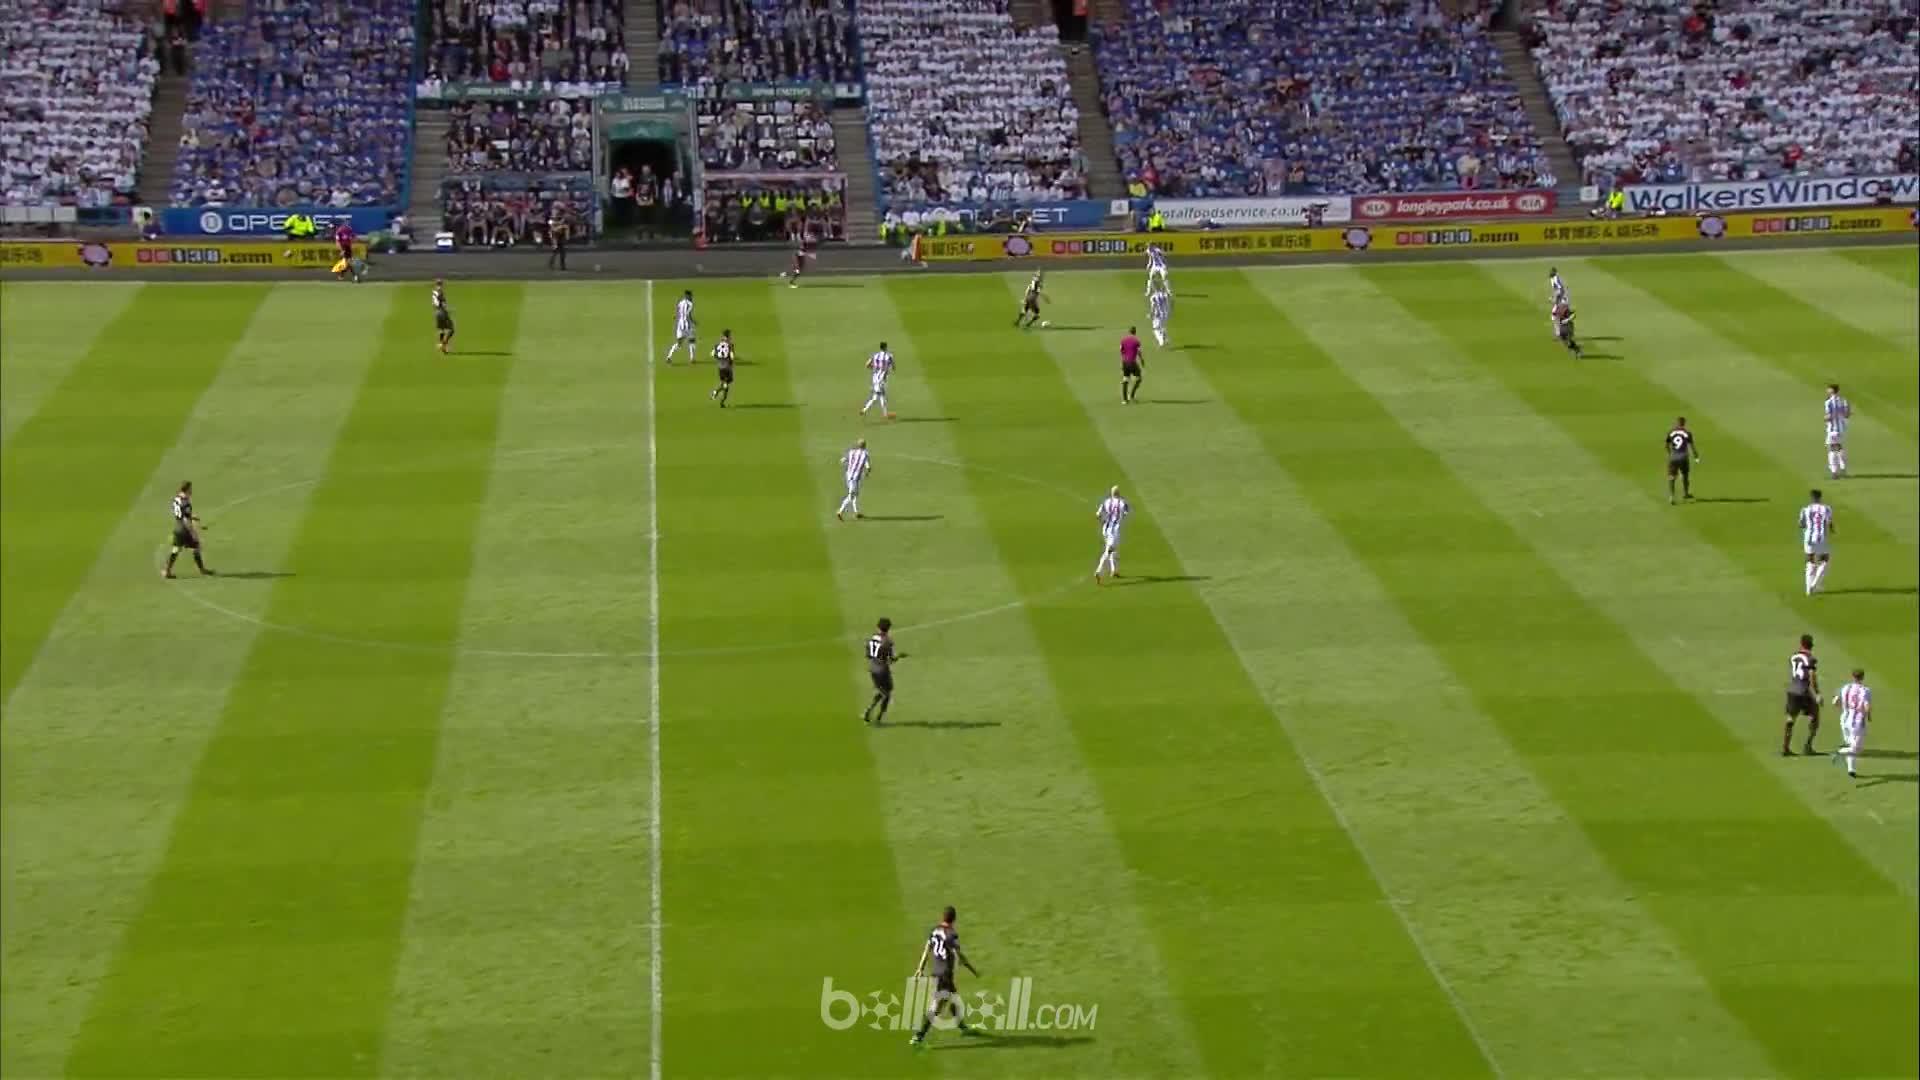 Goal P Aubameyang Huddersfield 0 - 1 Arsenal